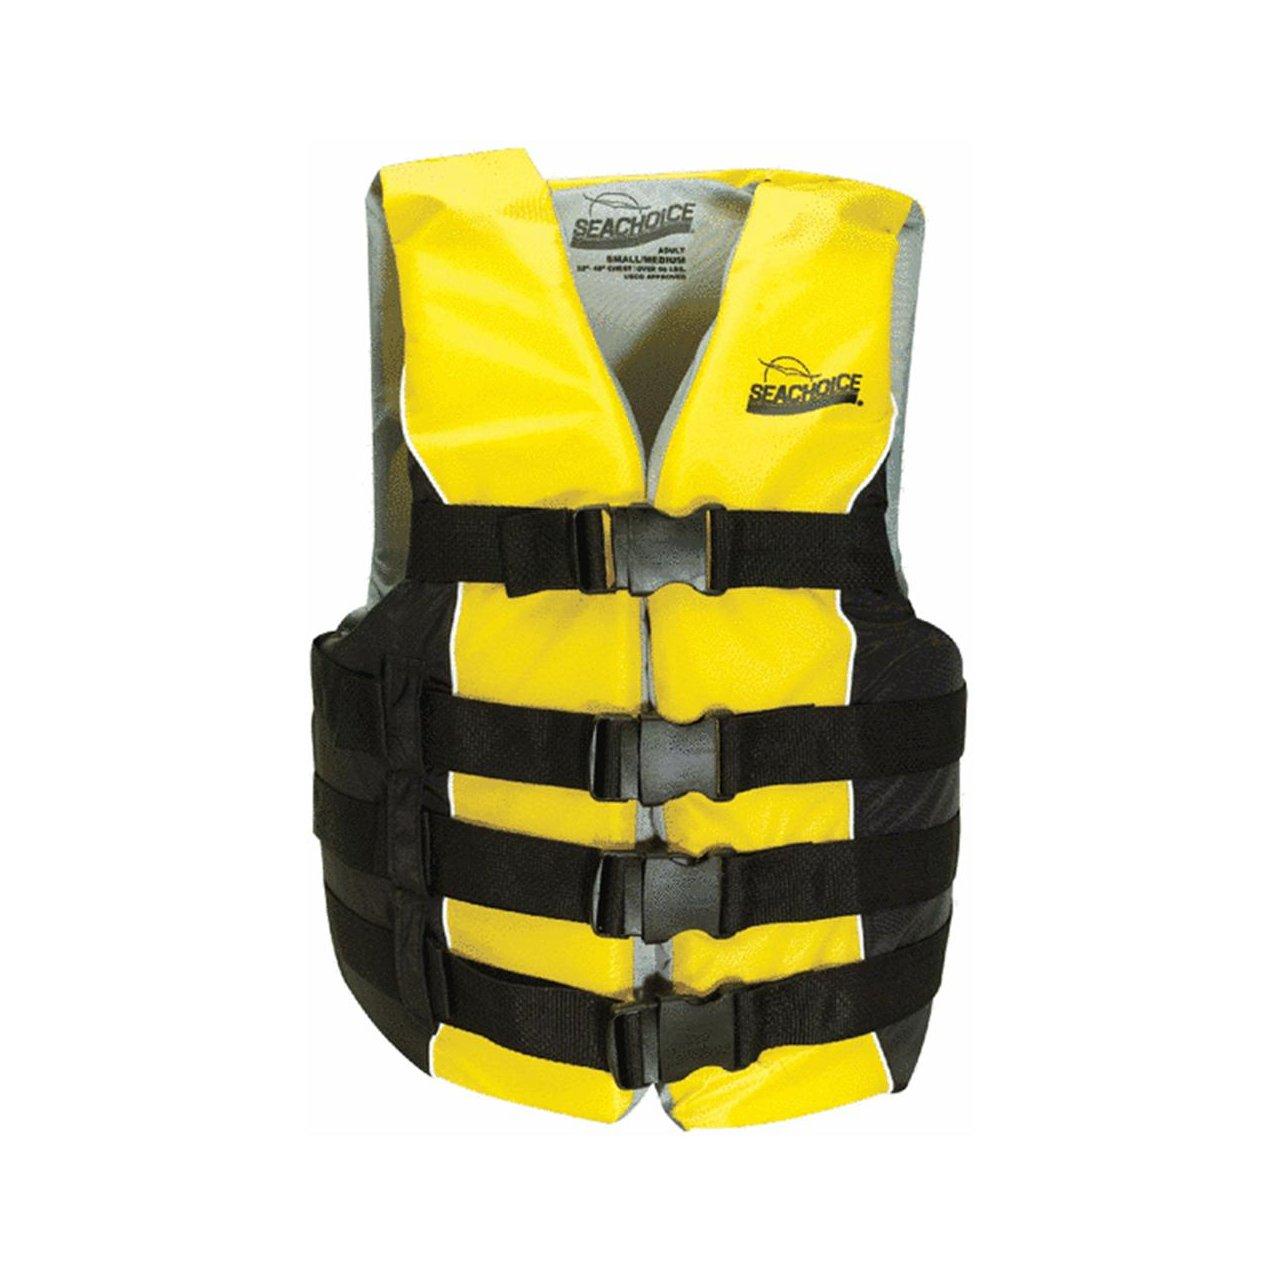 Seachoice Prod86420Deluxe Ski Vest-LG/XL 4 BELT SKI VEST (並行輸入品)   B000N9TH8O